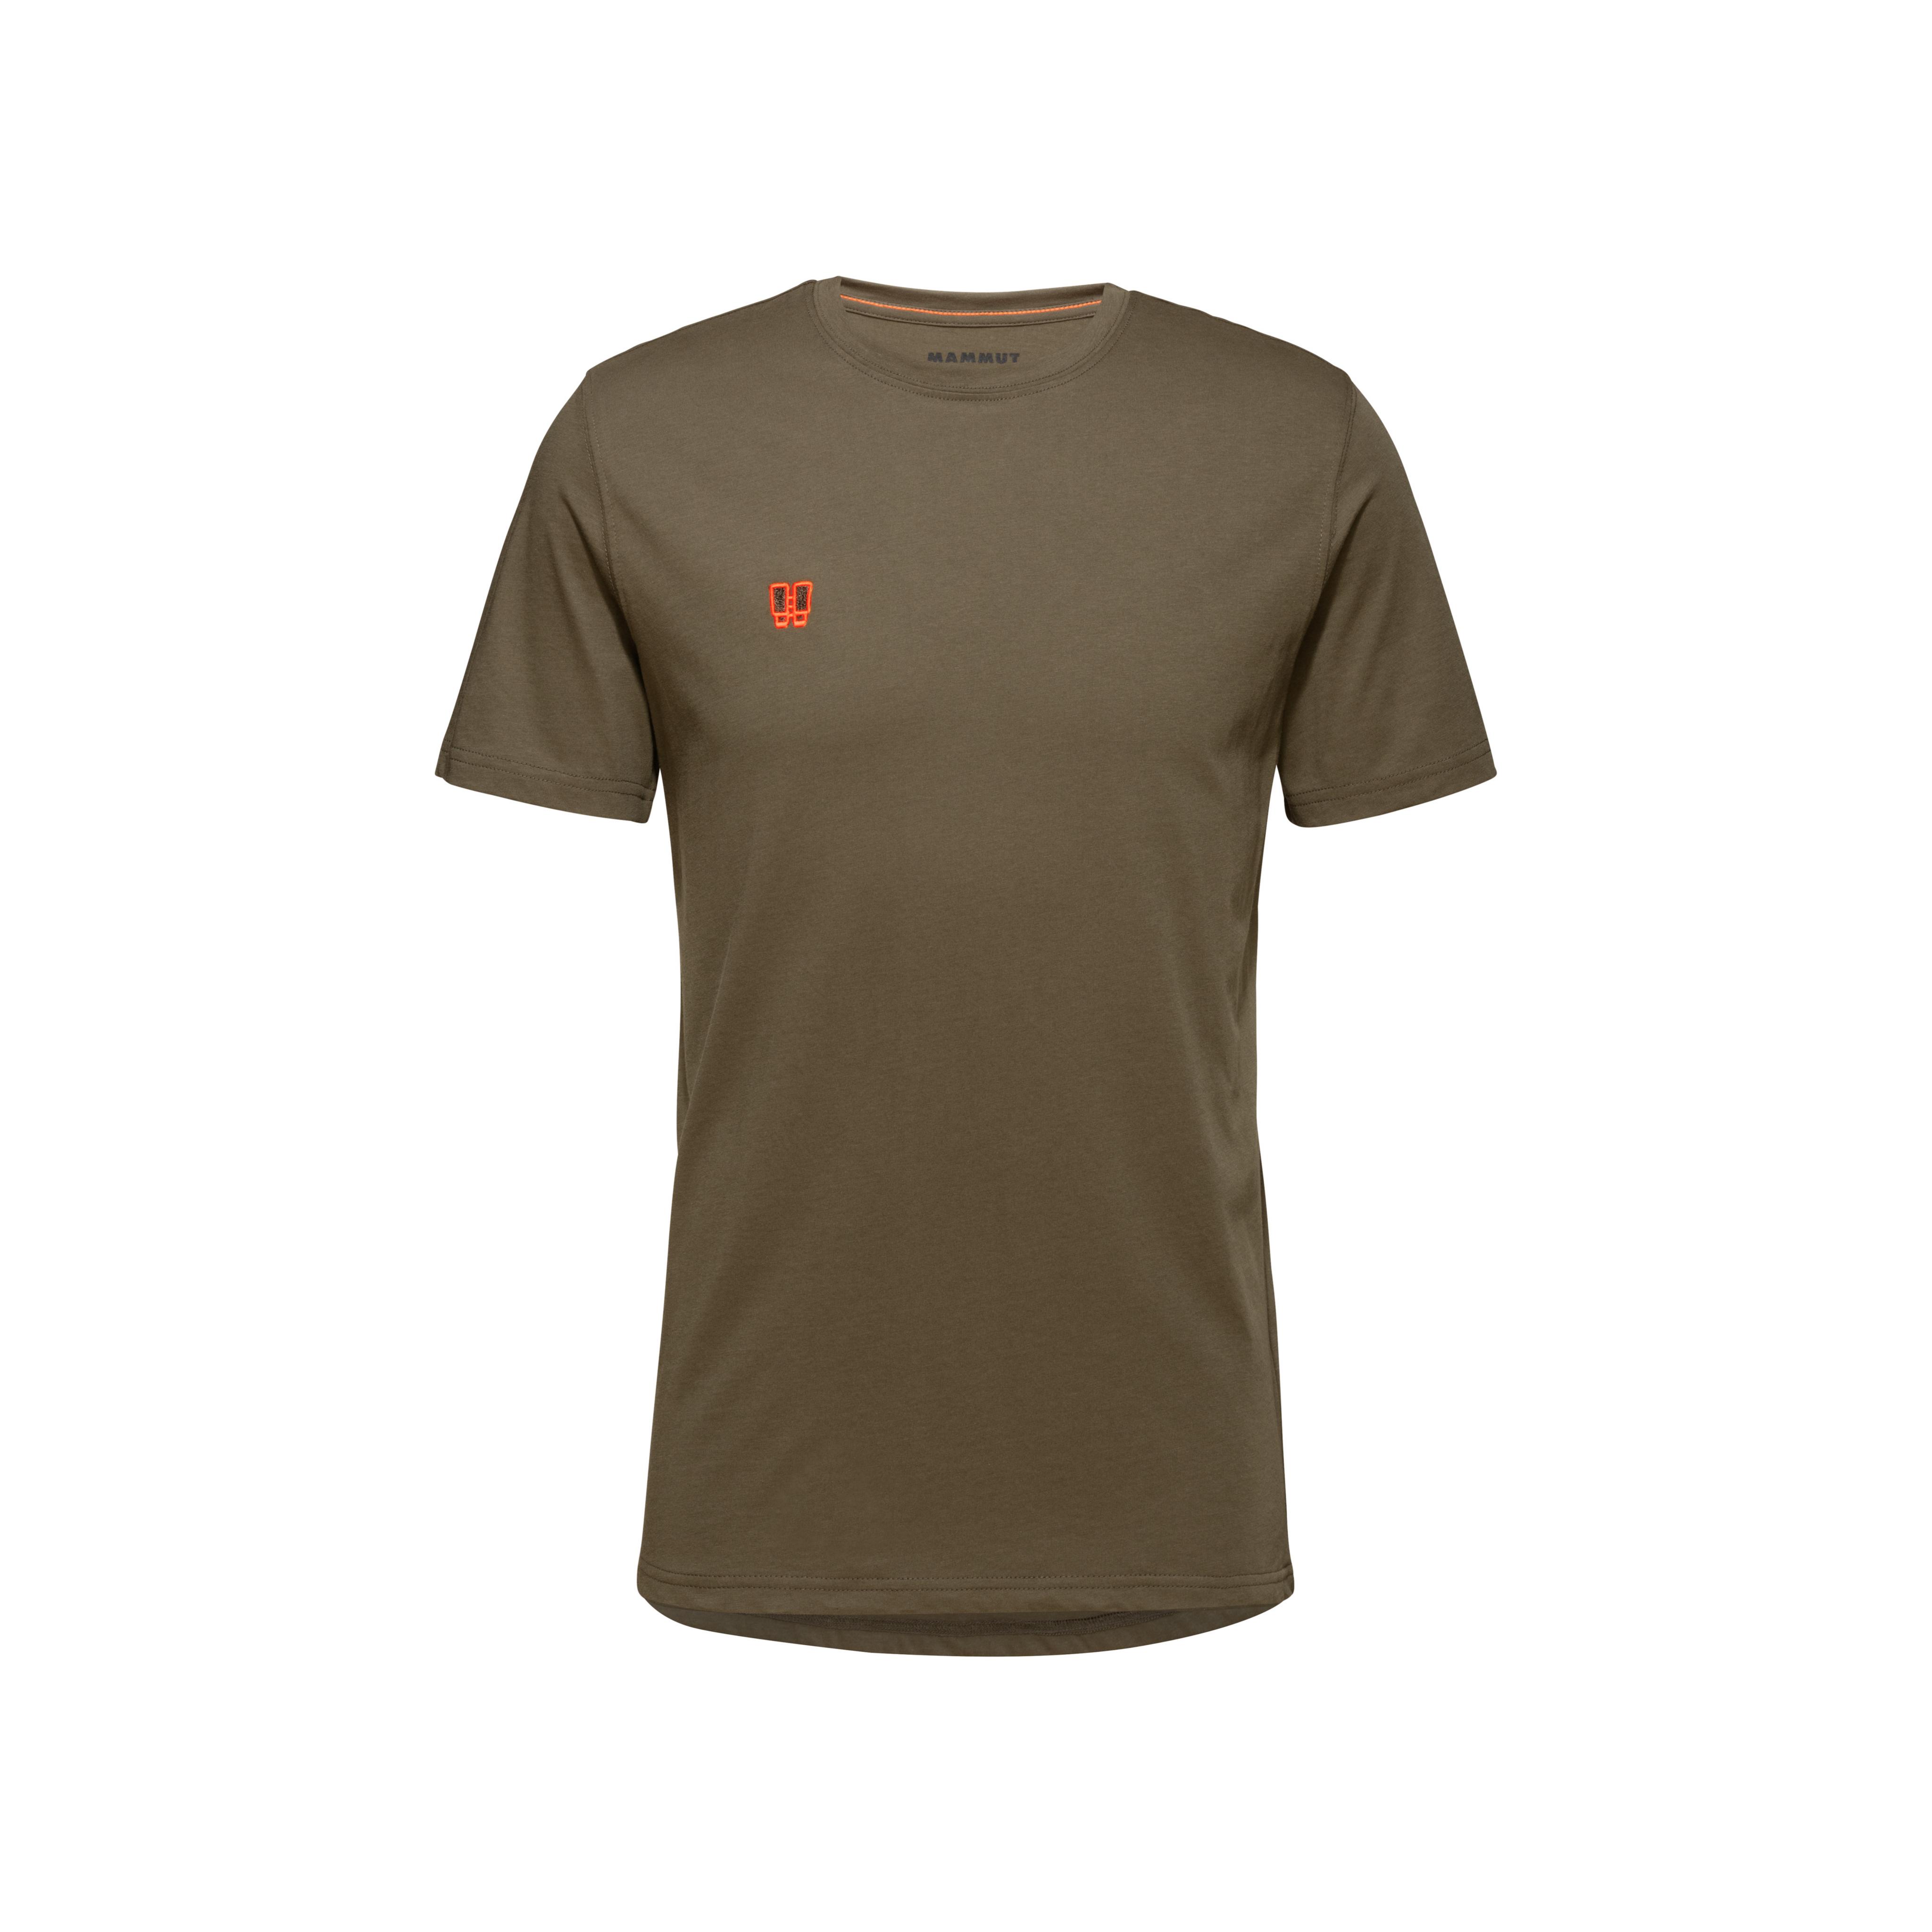 Mammut Essential T-Shirt - iguana binocular, XS thumbnail